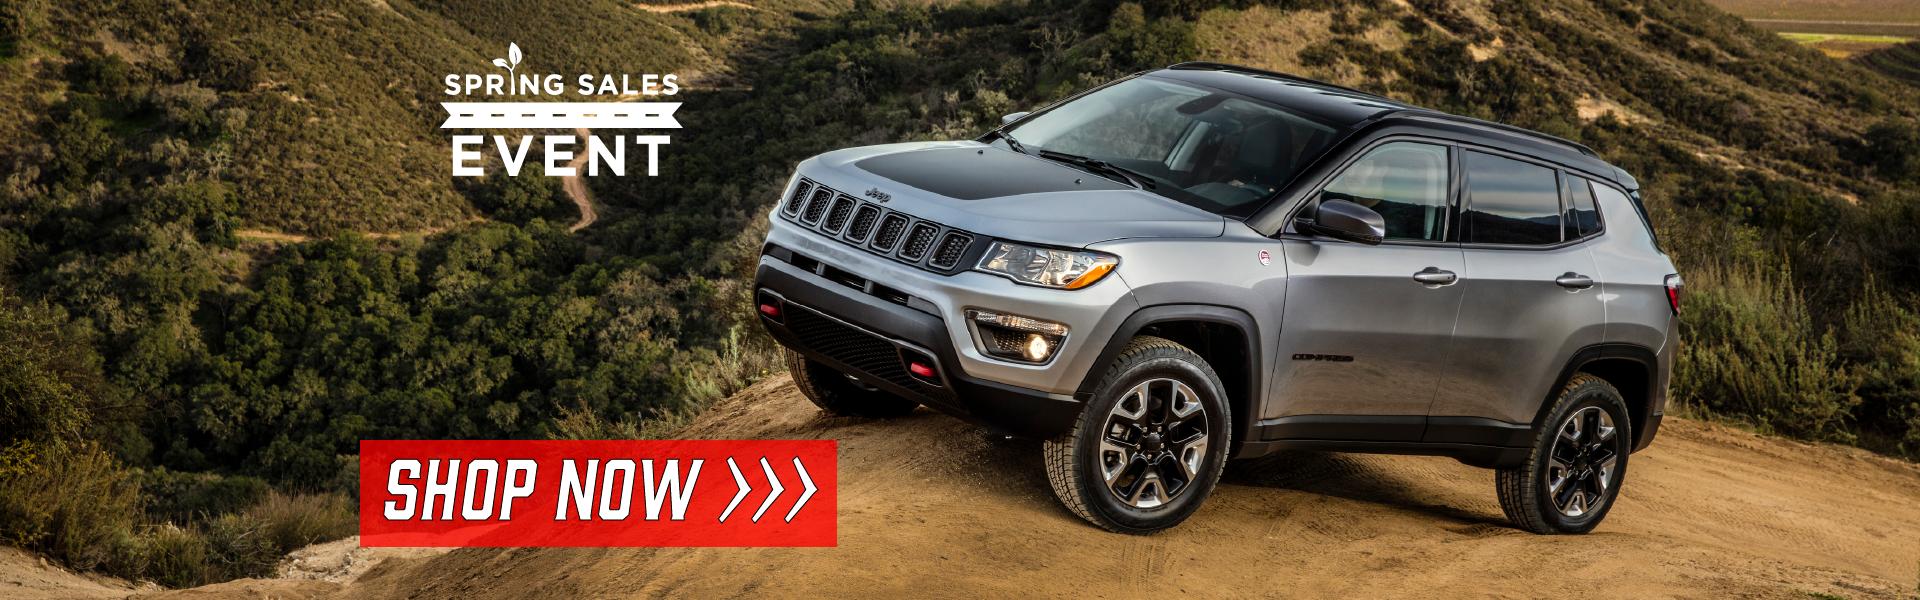 Tate Branch Artesia | Chrysler, Dodge, Jeep, Ram Dealer in ...